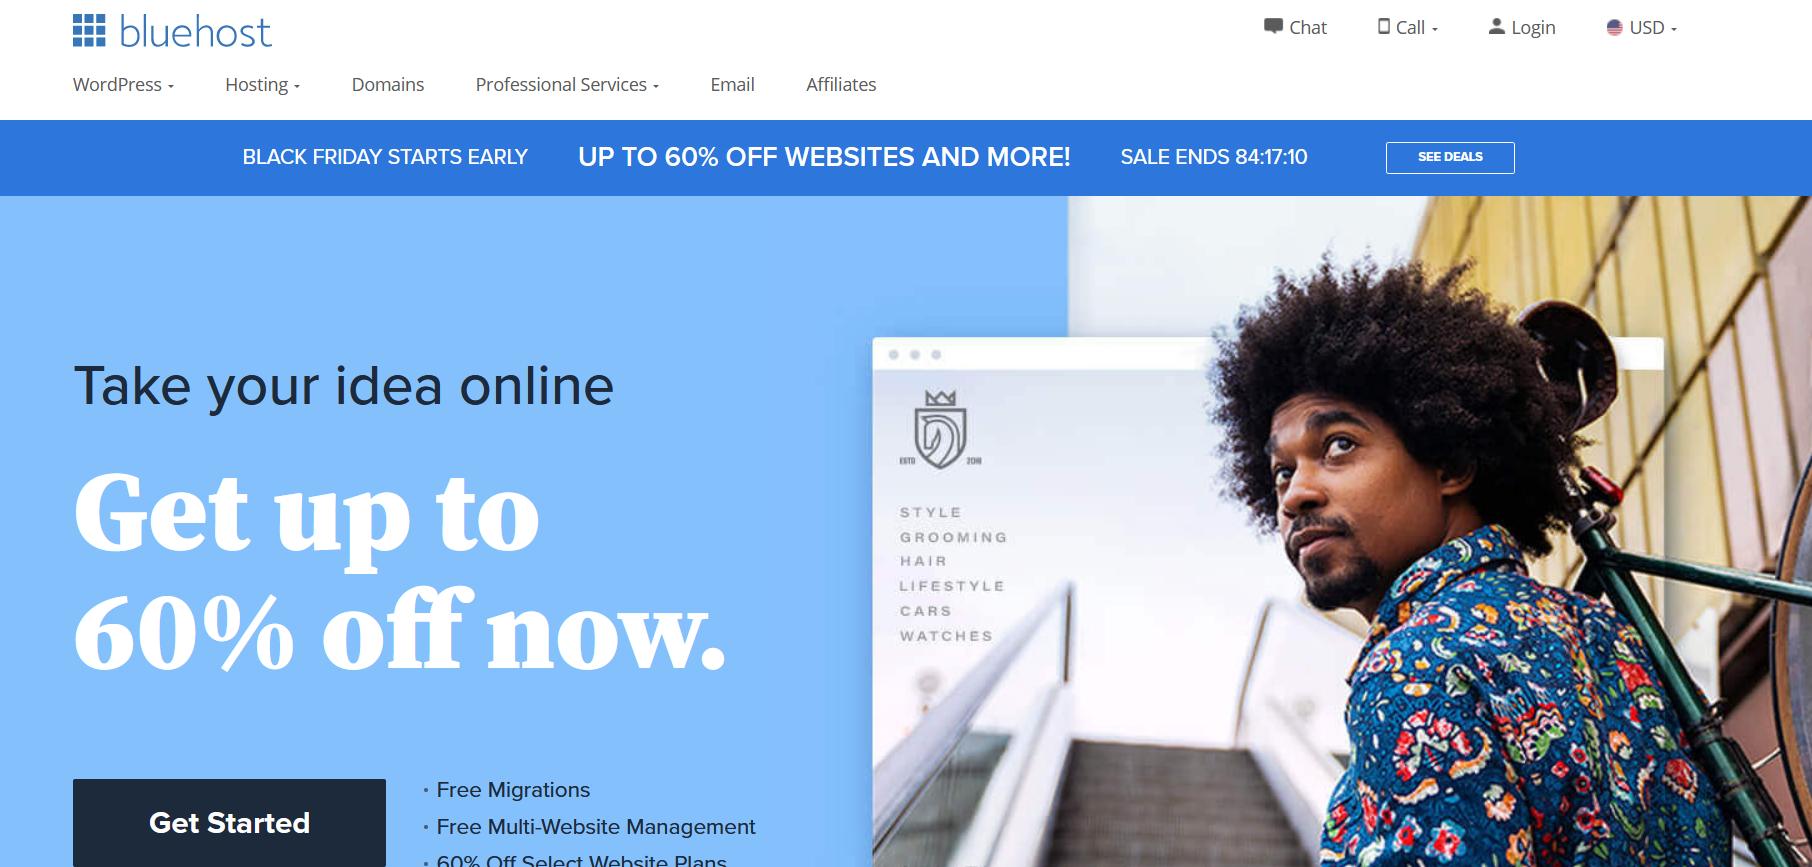 WordPress Hosting Services - bluehost